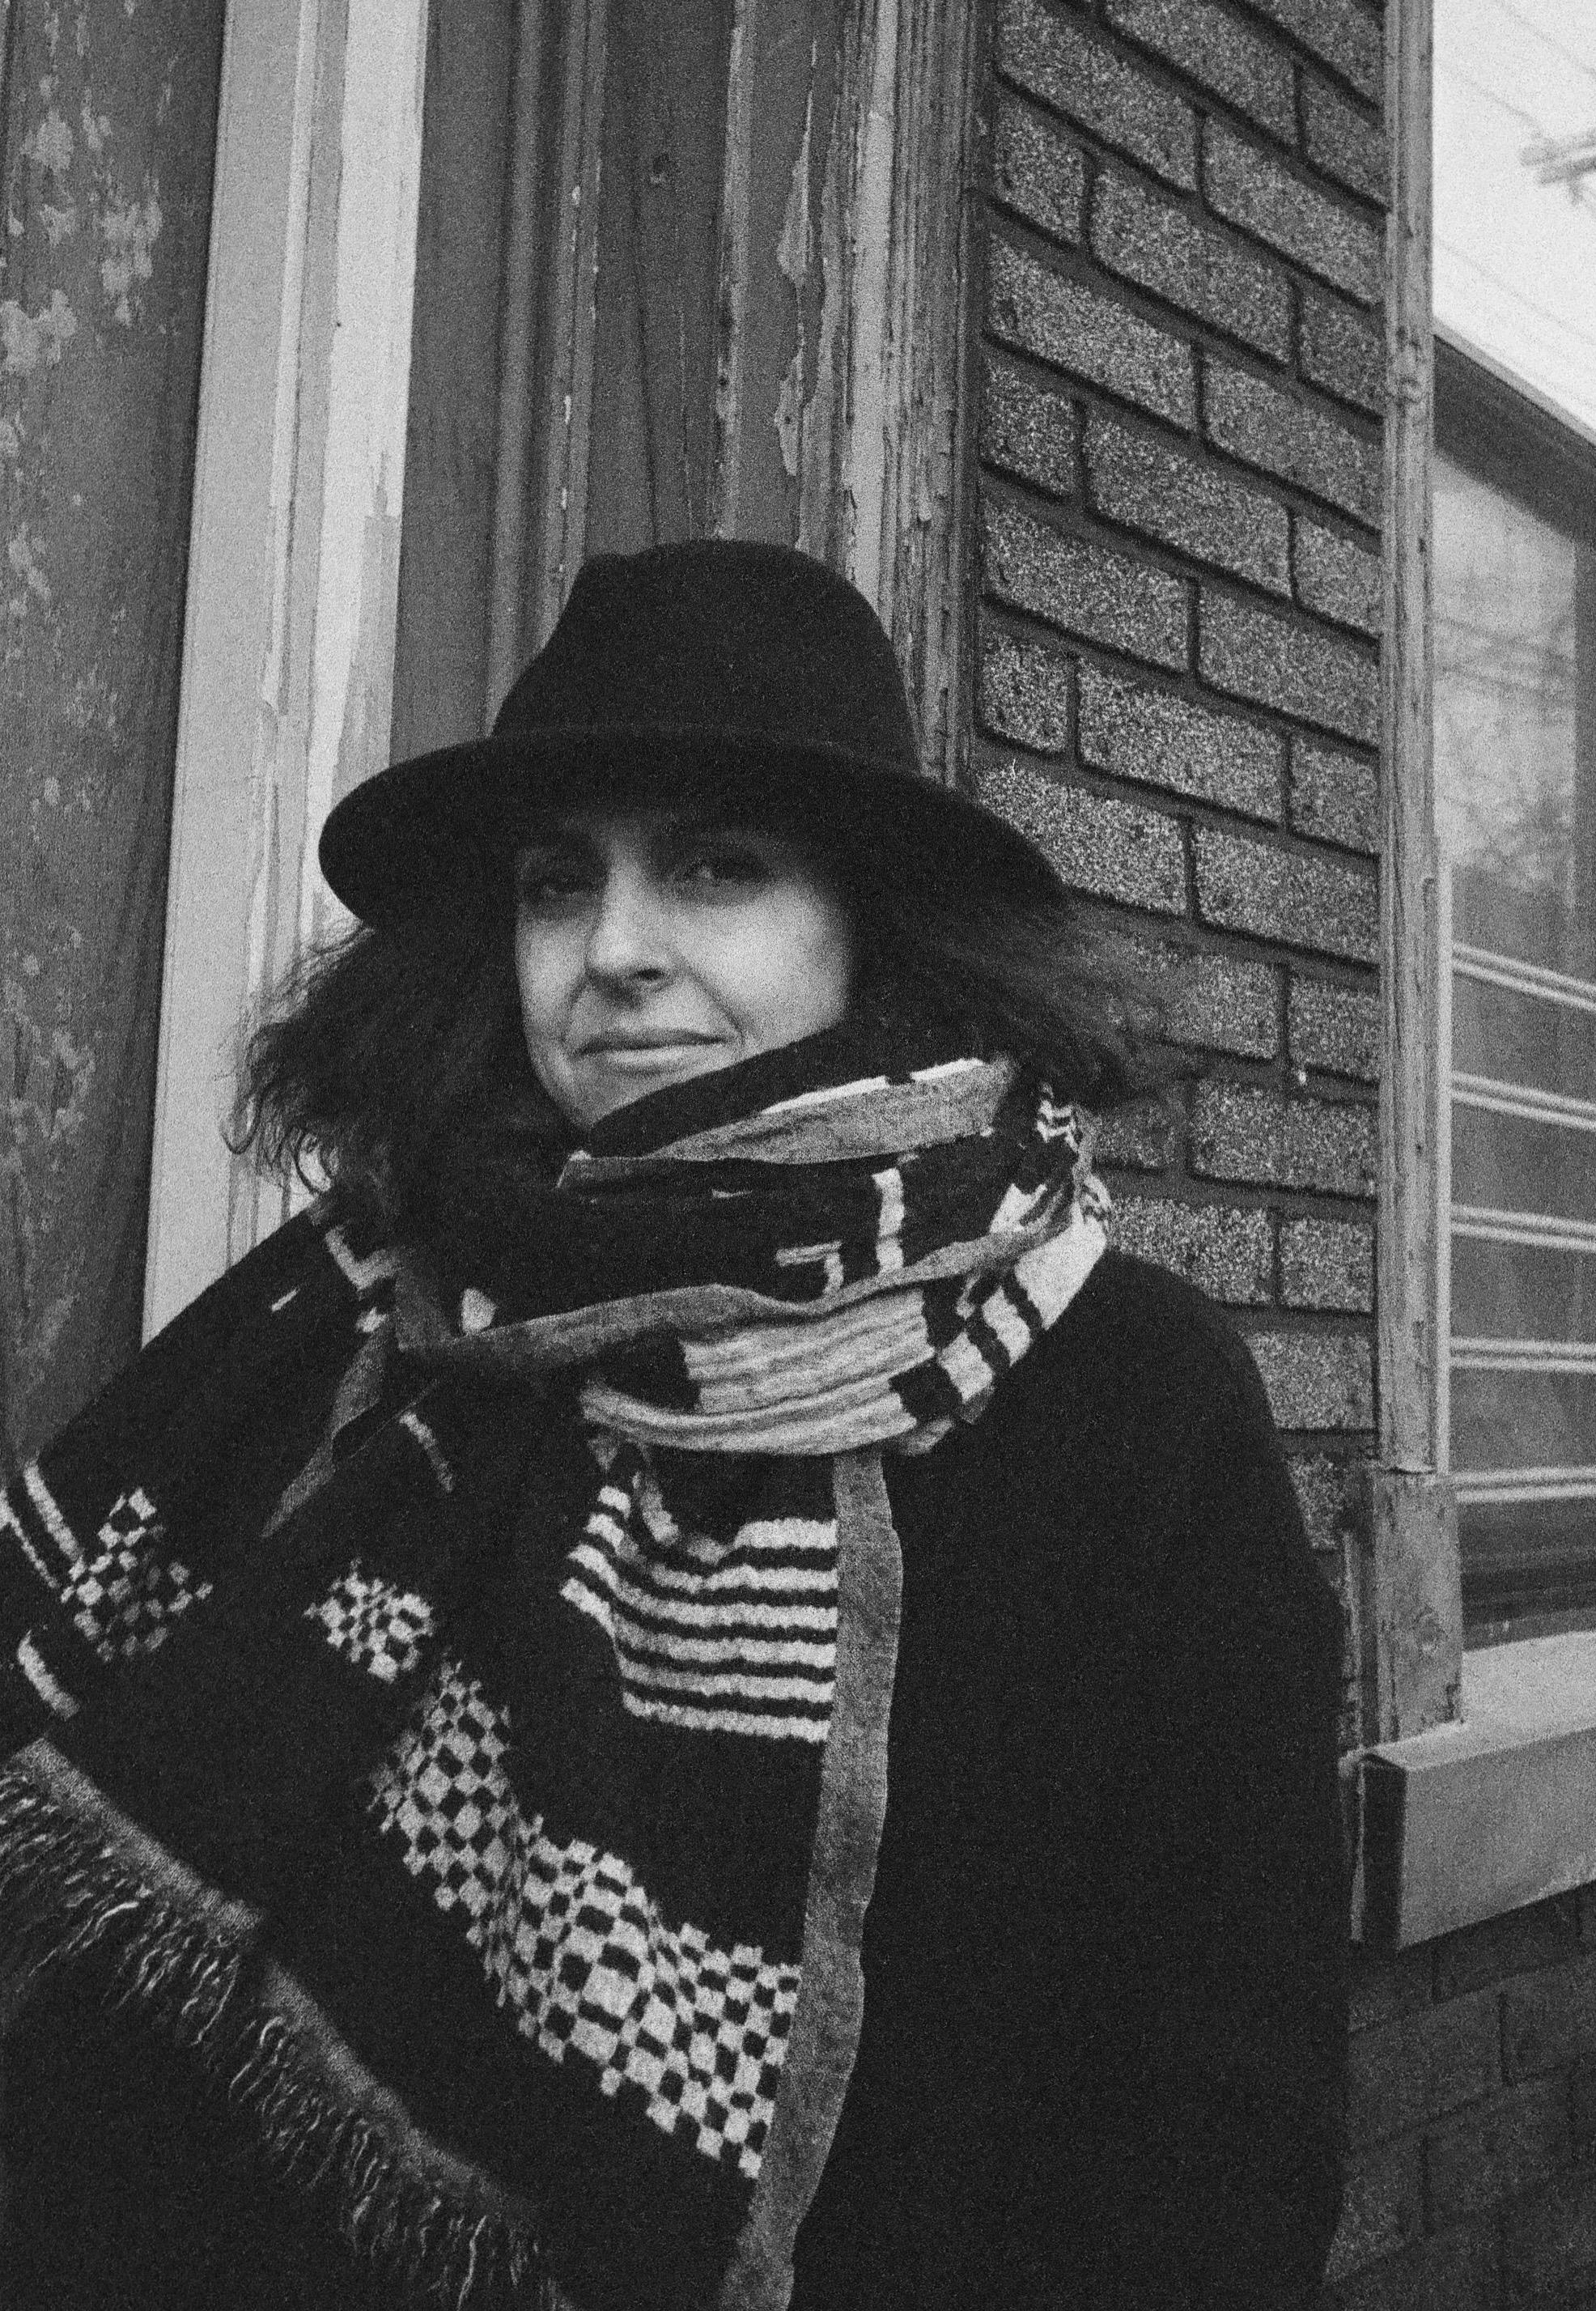 Rania in Brooklyn, NY Photo by Rachel Kessler